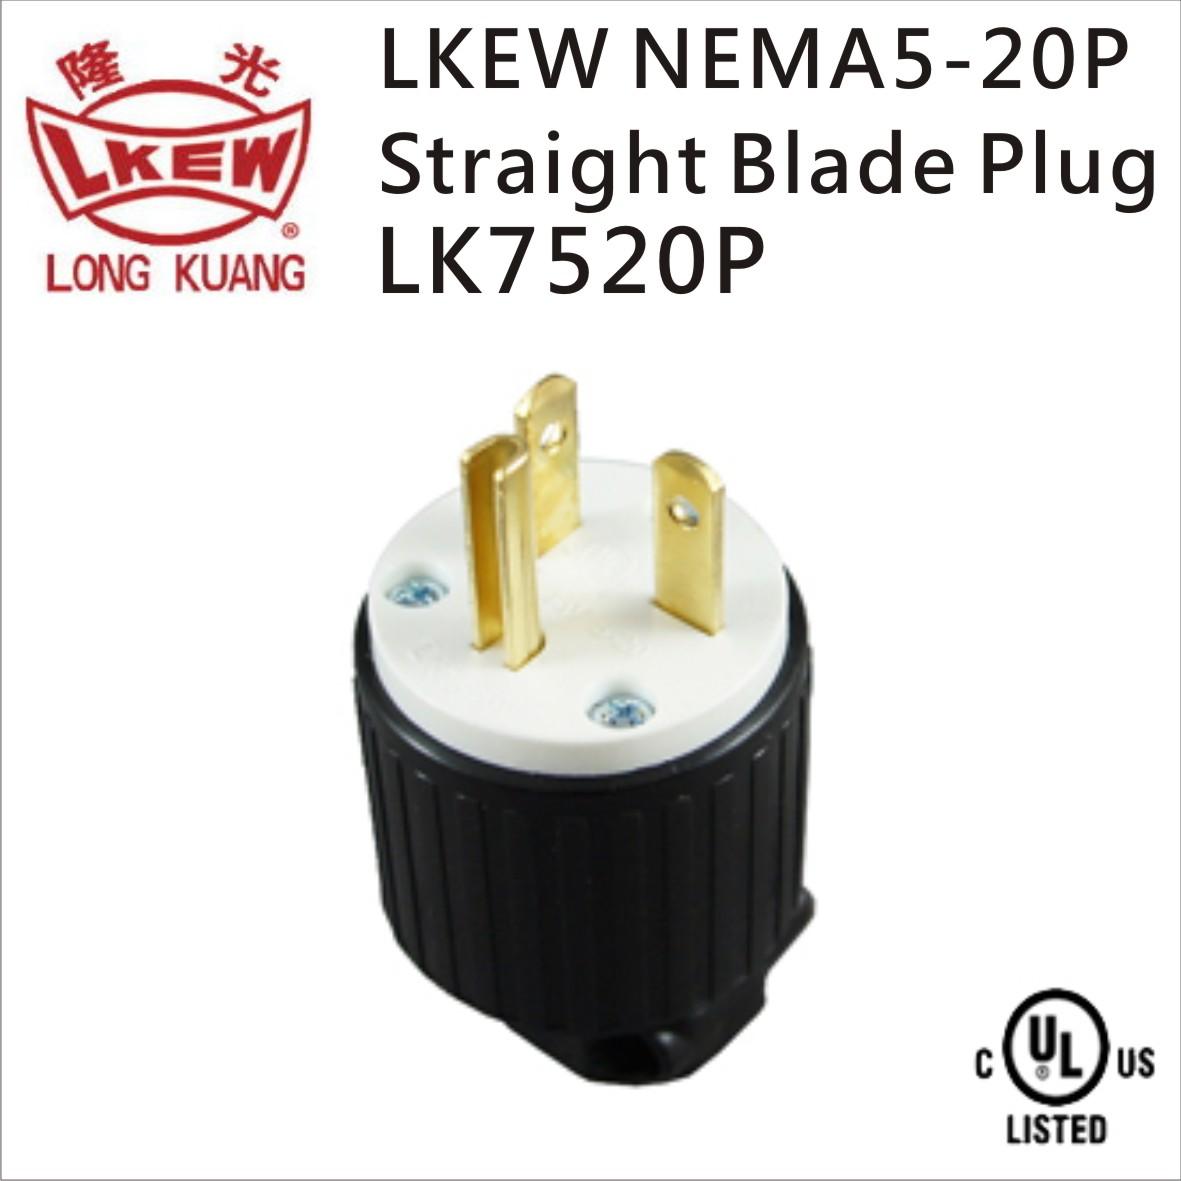 hight resolution of taiwan lkew nema straight blade plug wiring lk7520p 5 20p enproteko co ltd